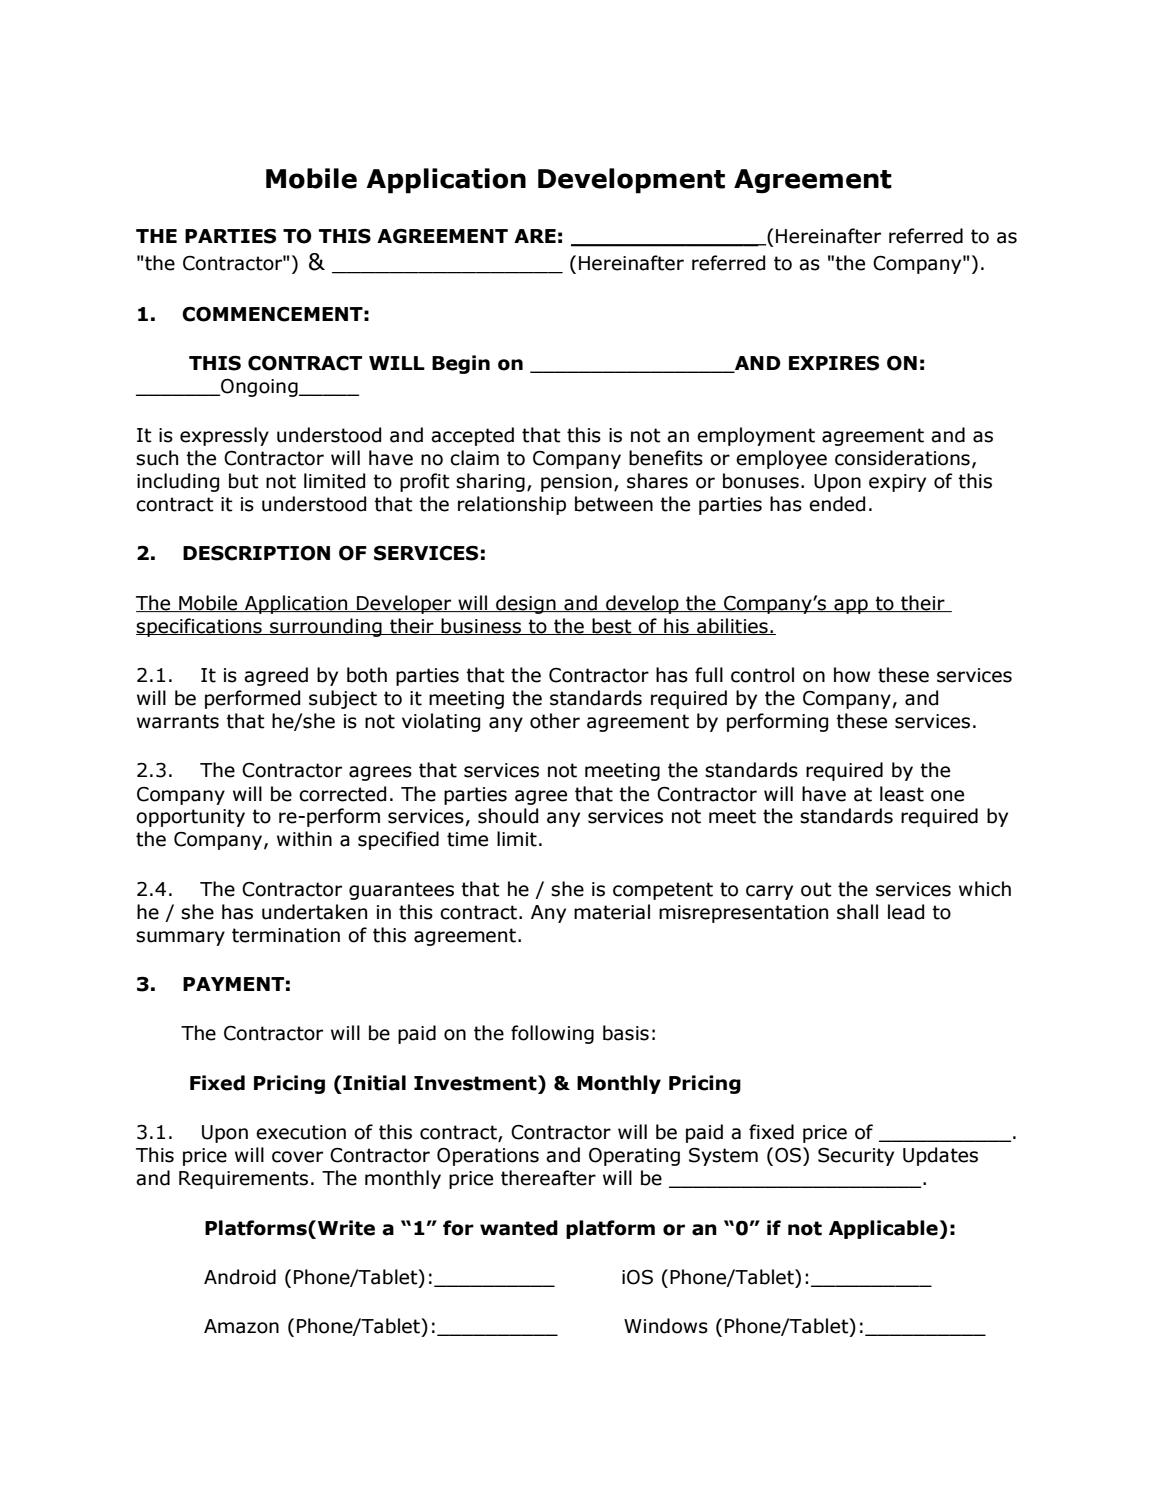 Mobile Application Development Agreement By Eli Wheaton